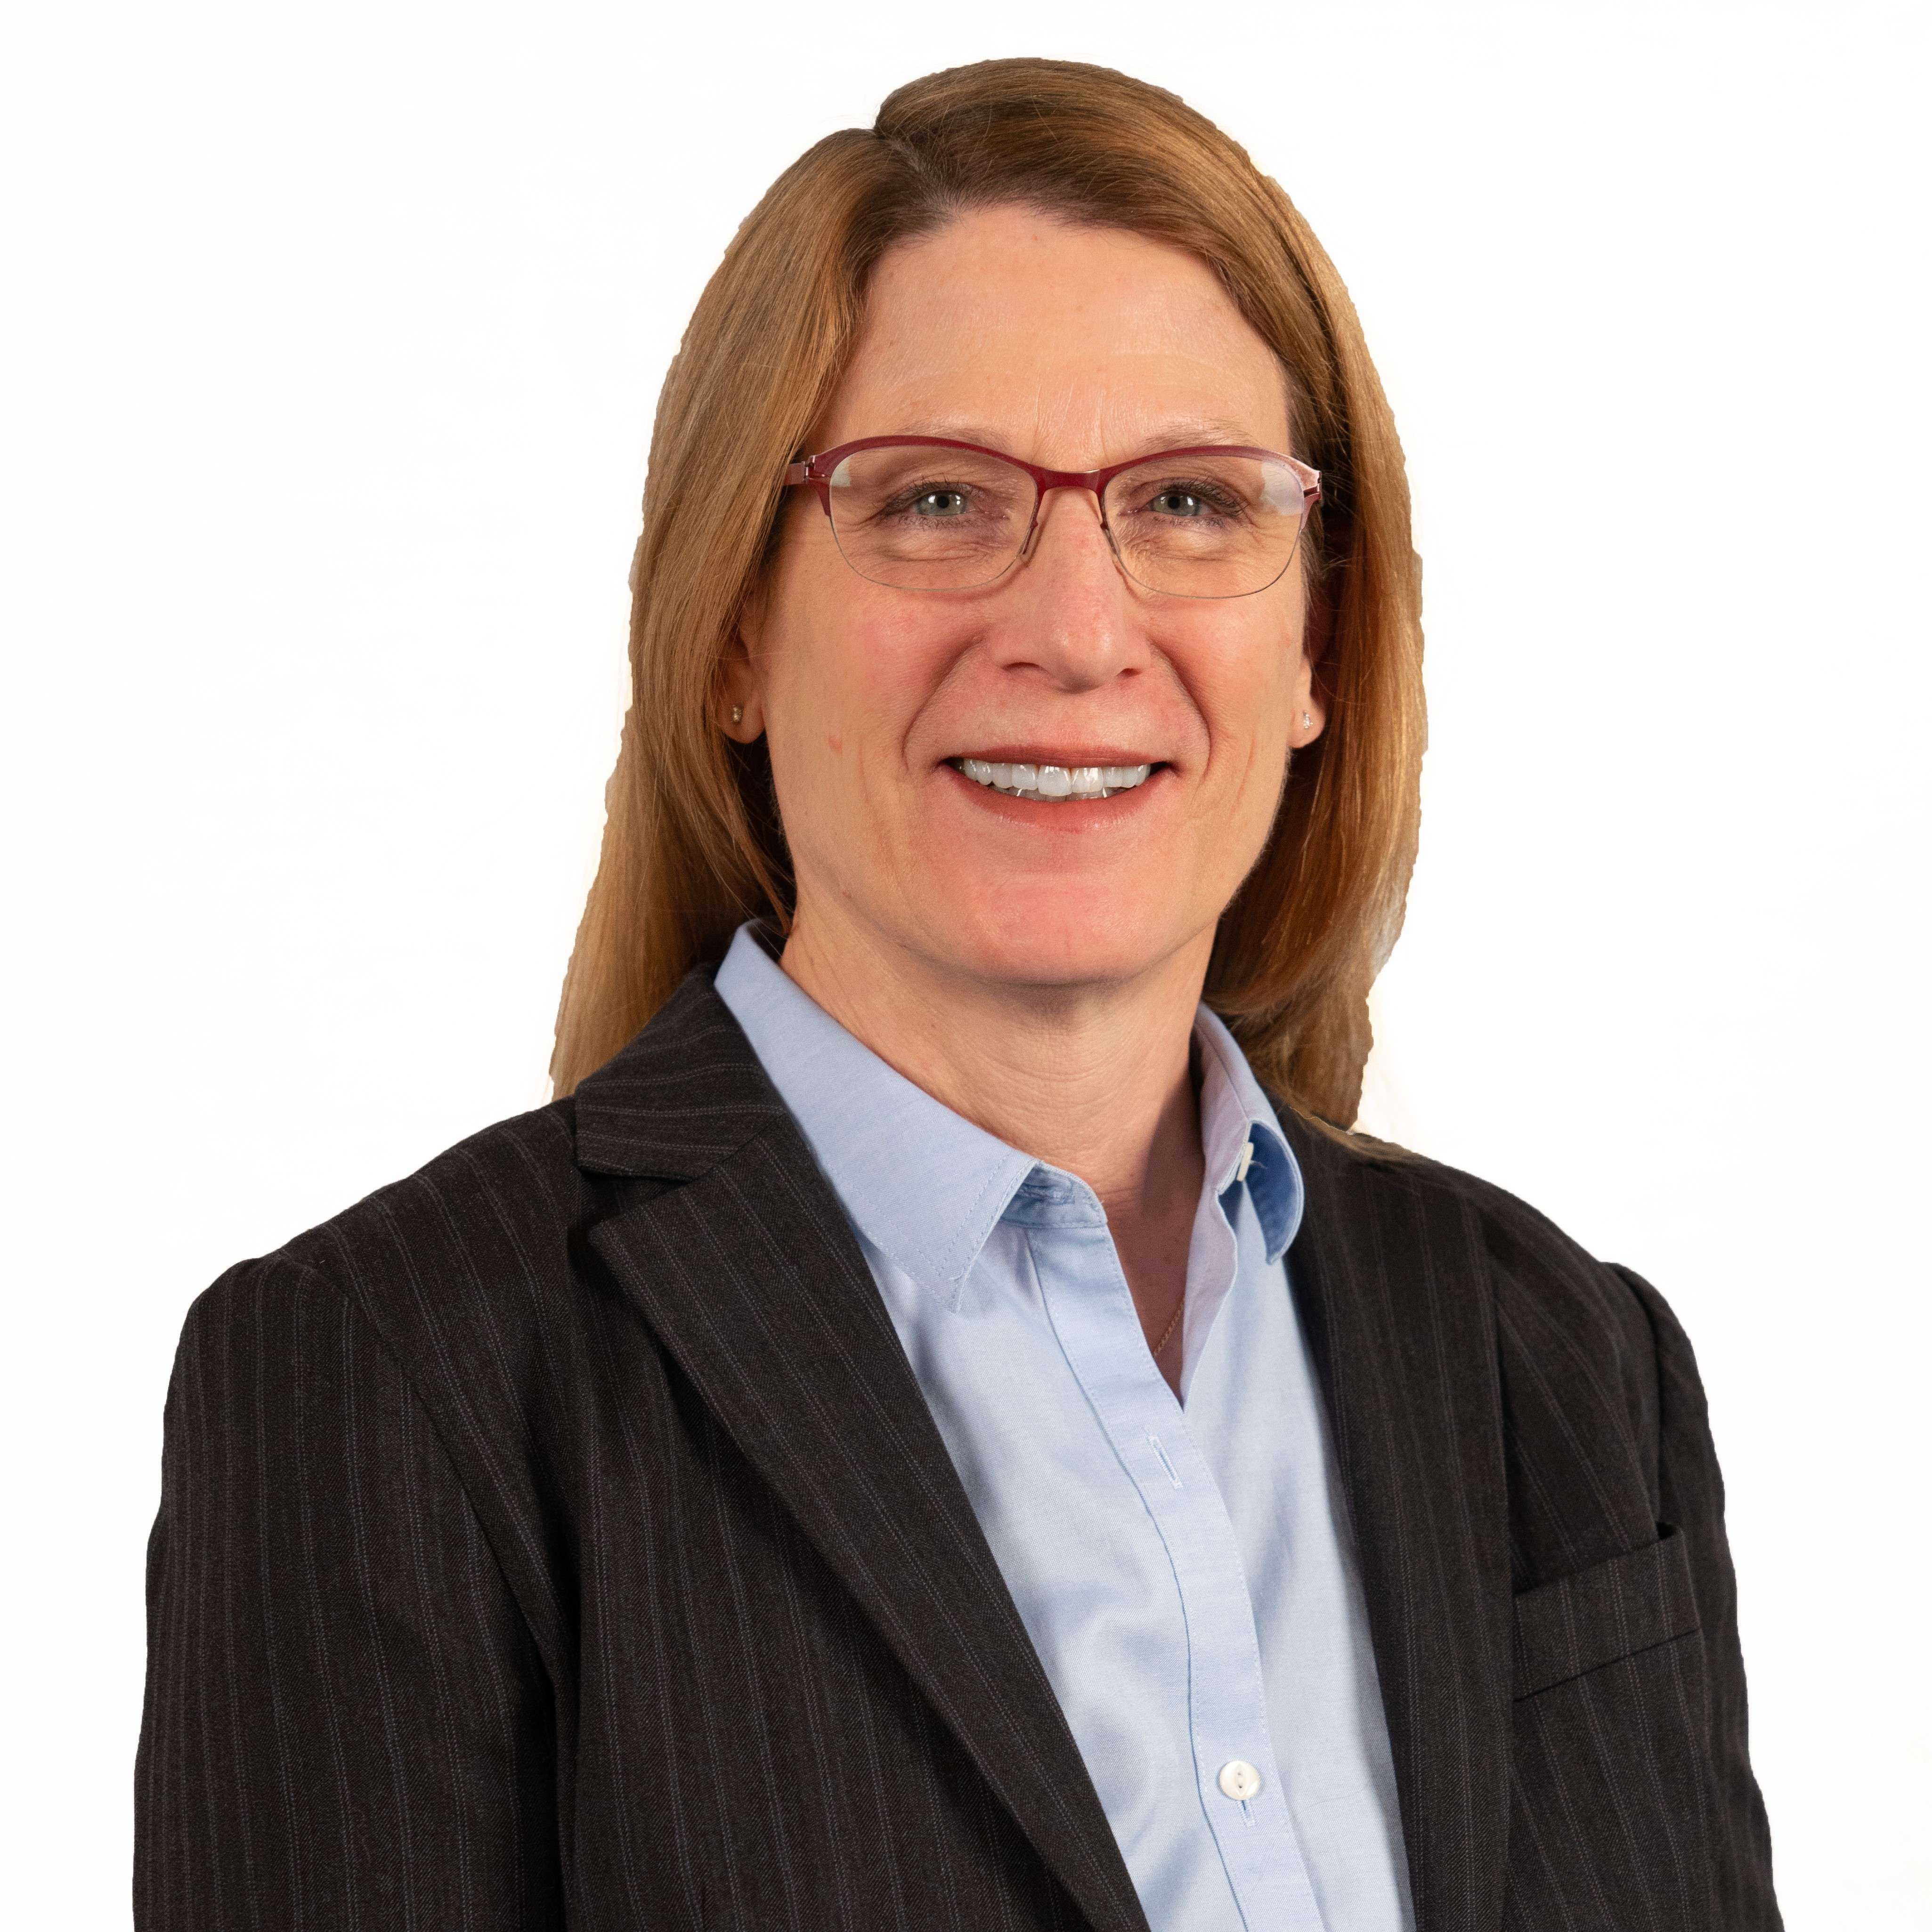 TurbineAero, Inc. Announces new Vice President Sales & Marketing – Donna J. Chase